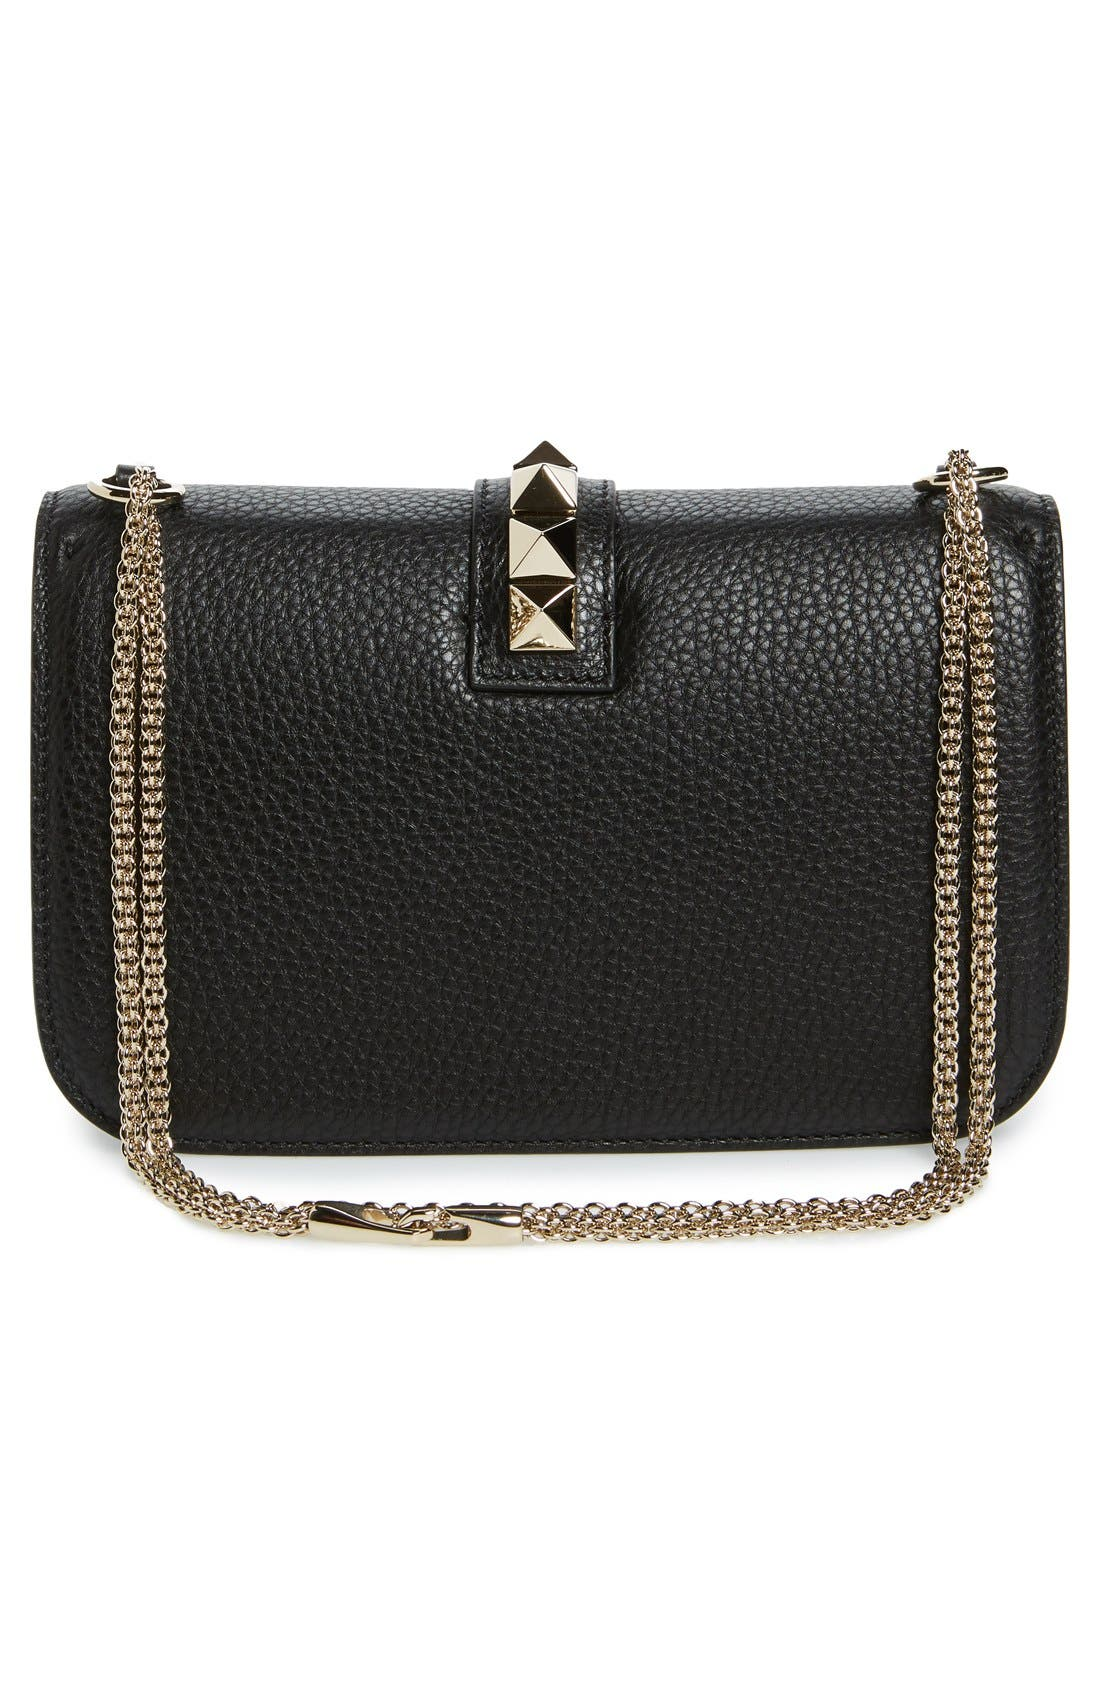 Medium Lock Studded Leather Shoulder Bag,                             Alternate thumbnail 3, color,                             NERO